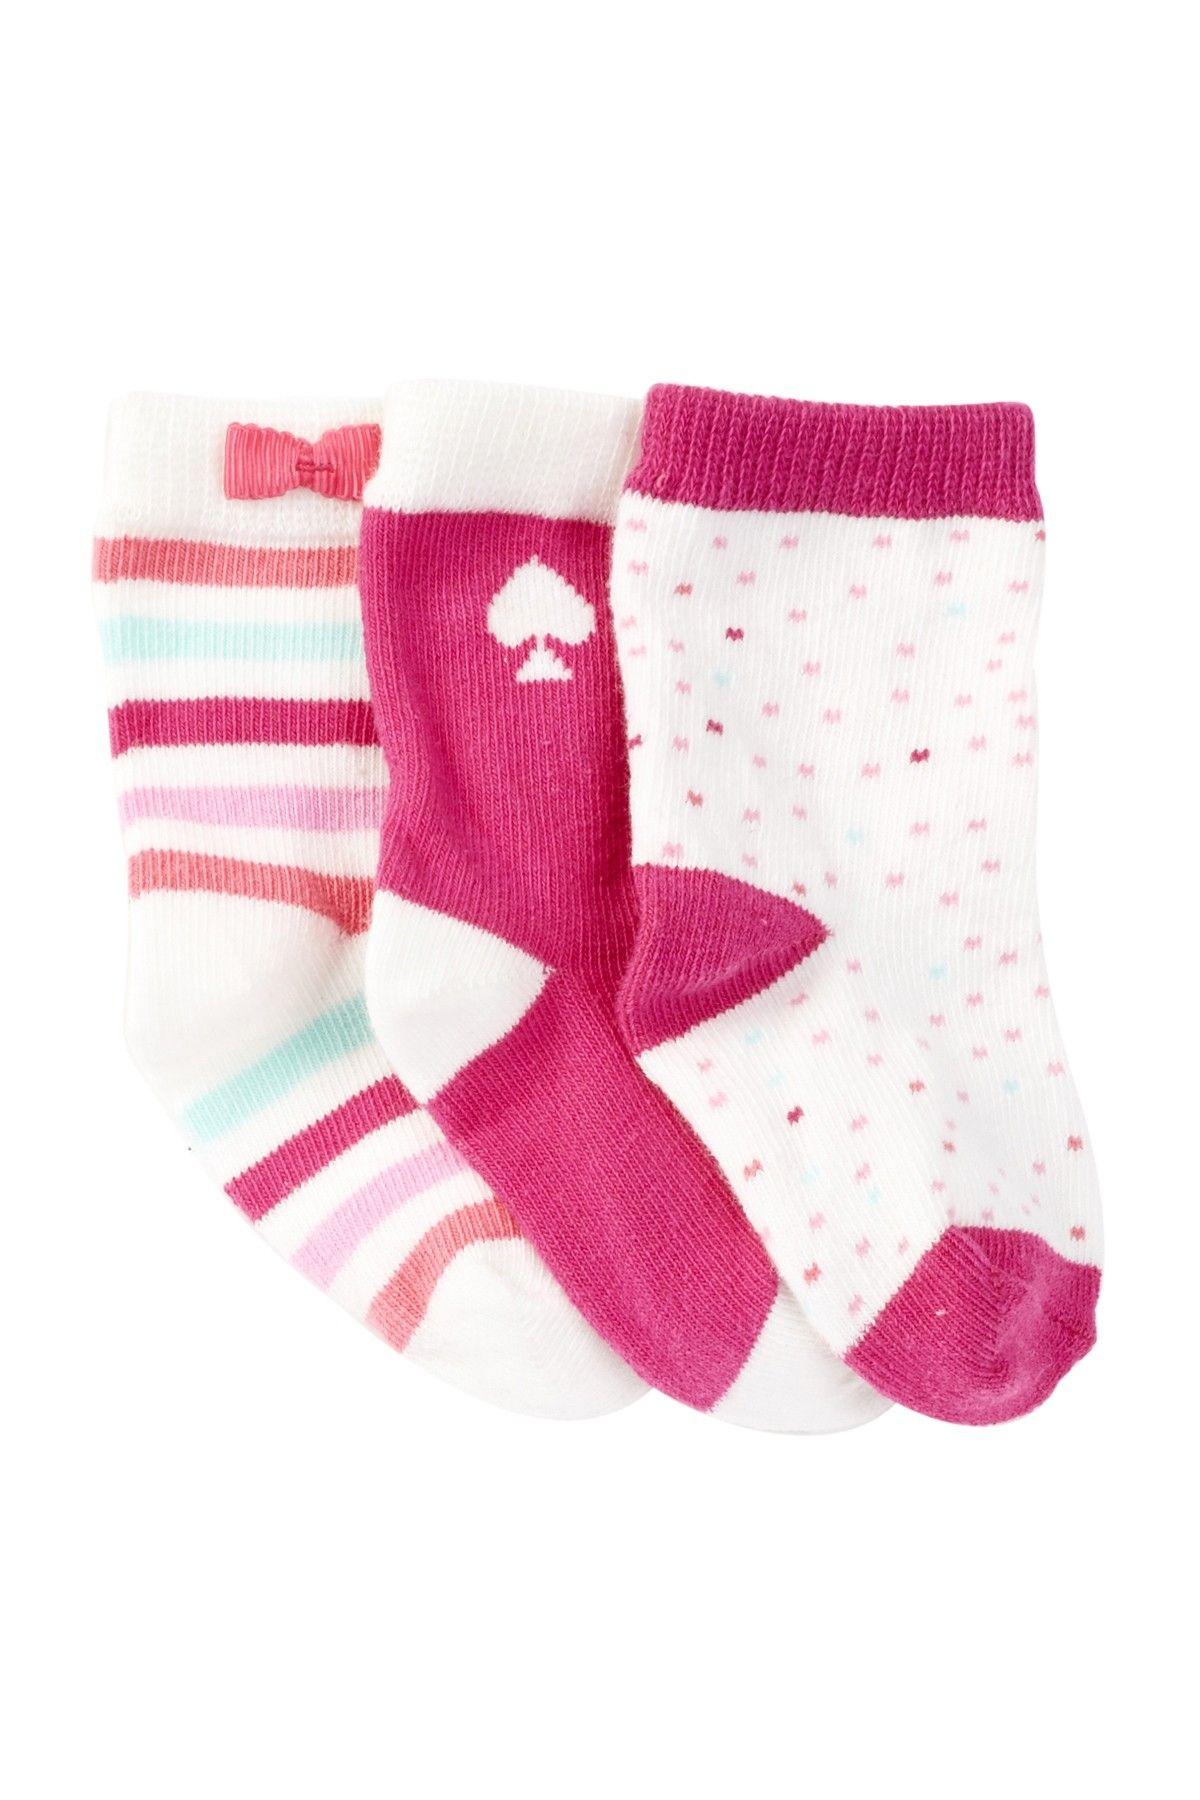 Box Sock Set Pack of 3 Baby Girls